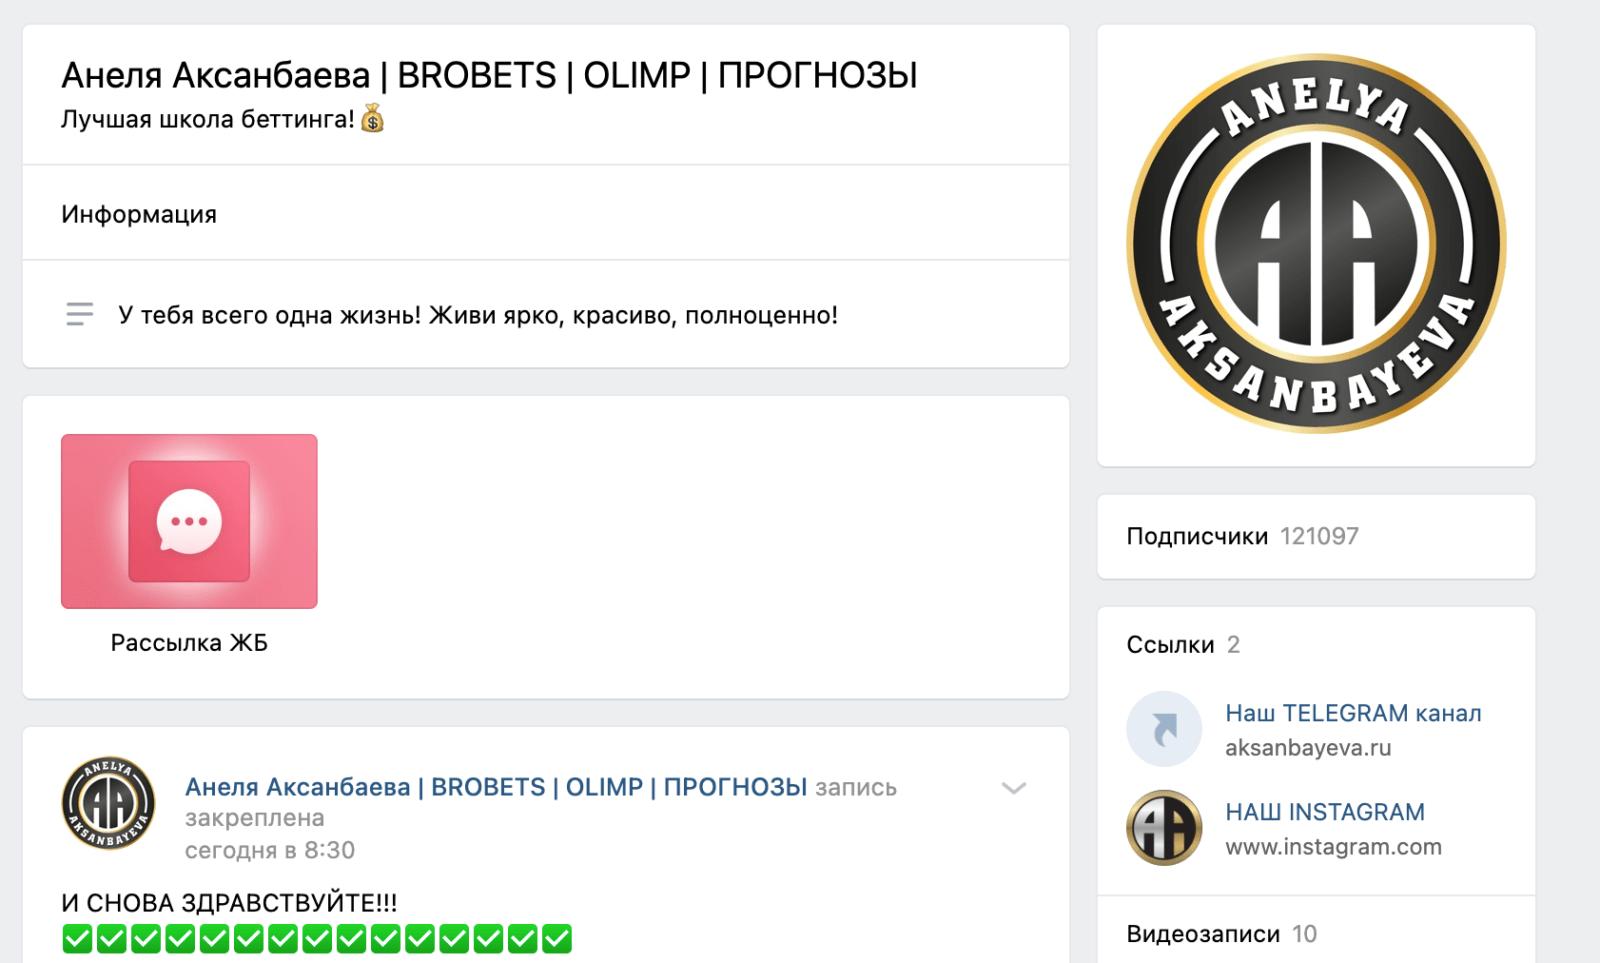 Группа ВК проекта Brobets Anelya Aksanbayeva (Анеля Аксанбаева)